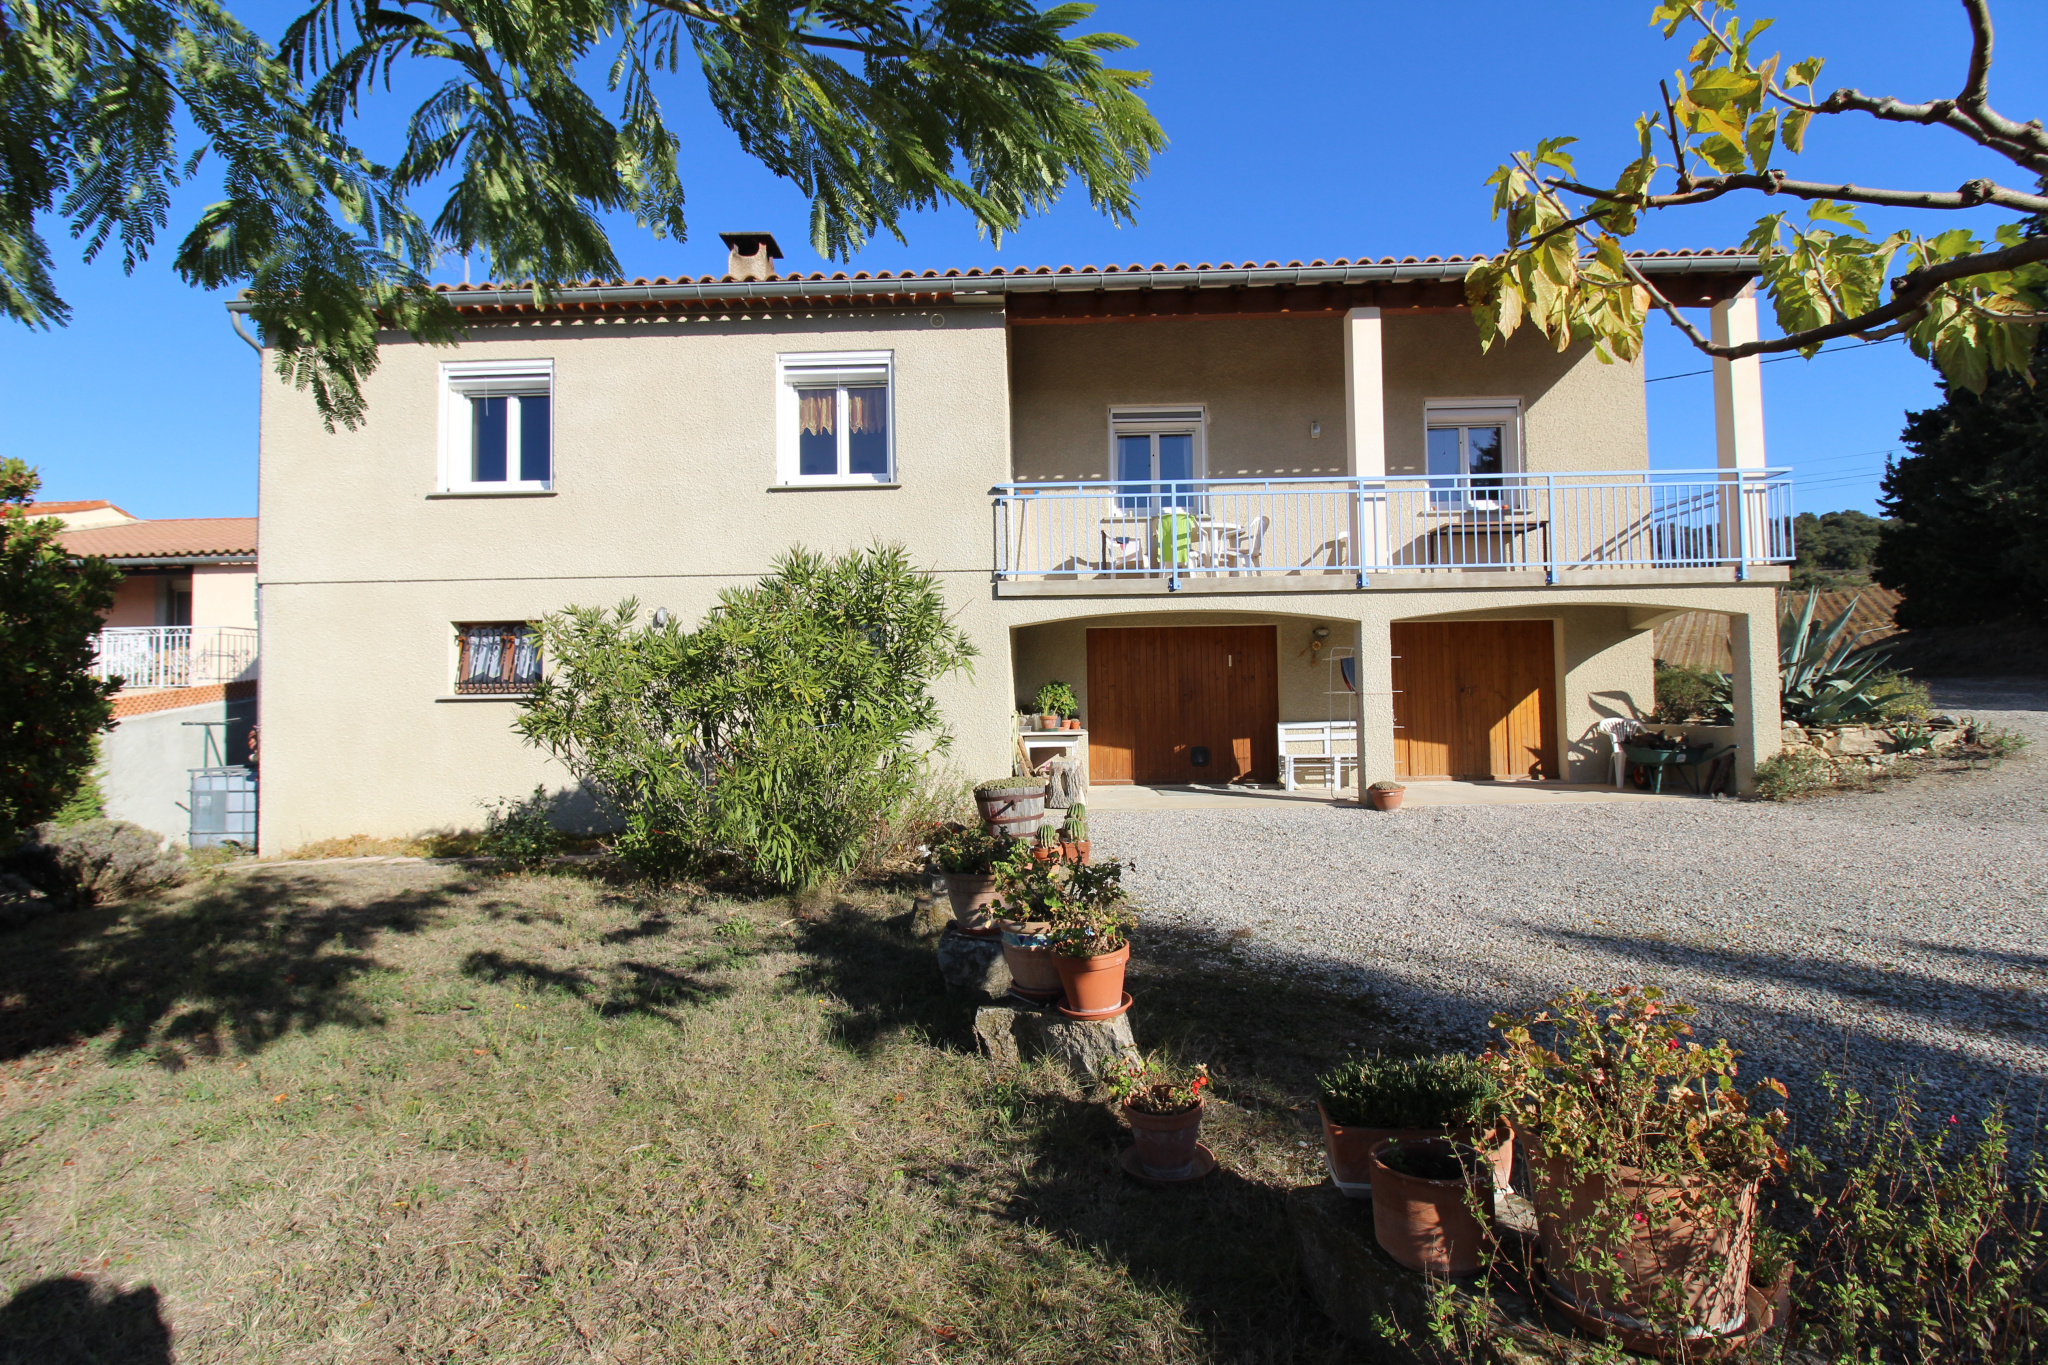 Bac immobilier limoux carcassonne vente et location for Ca location immobilier